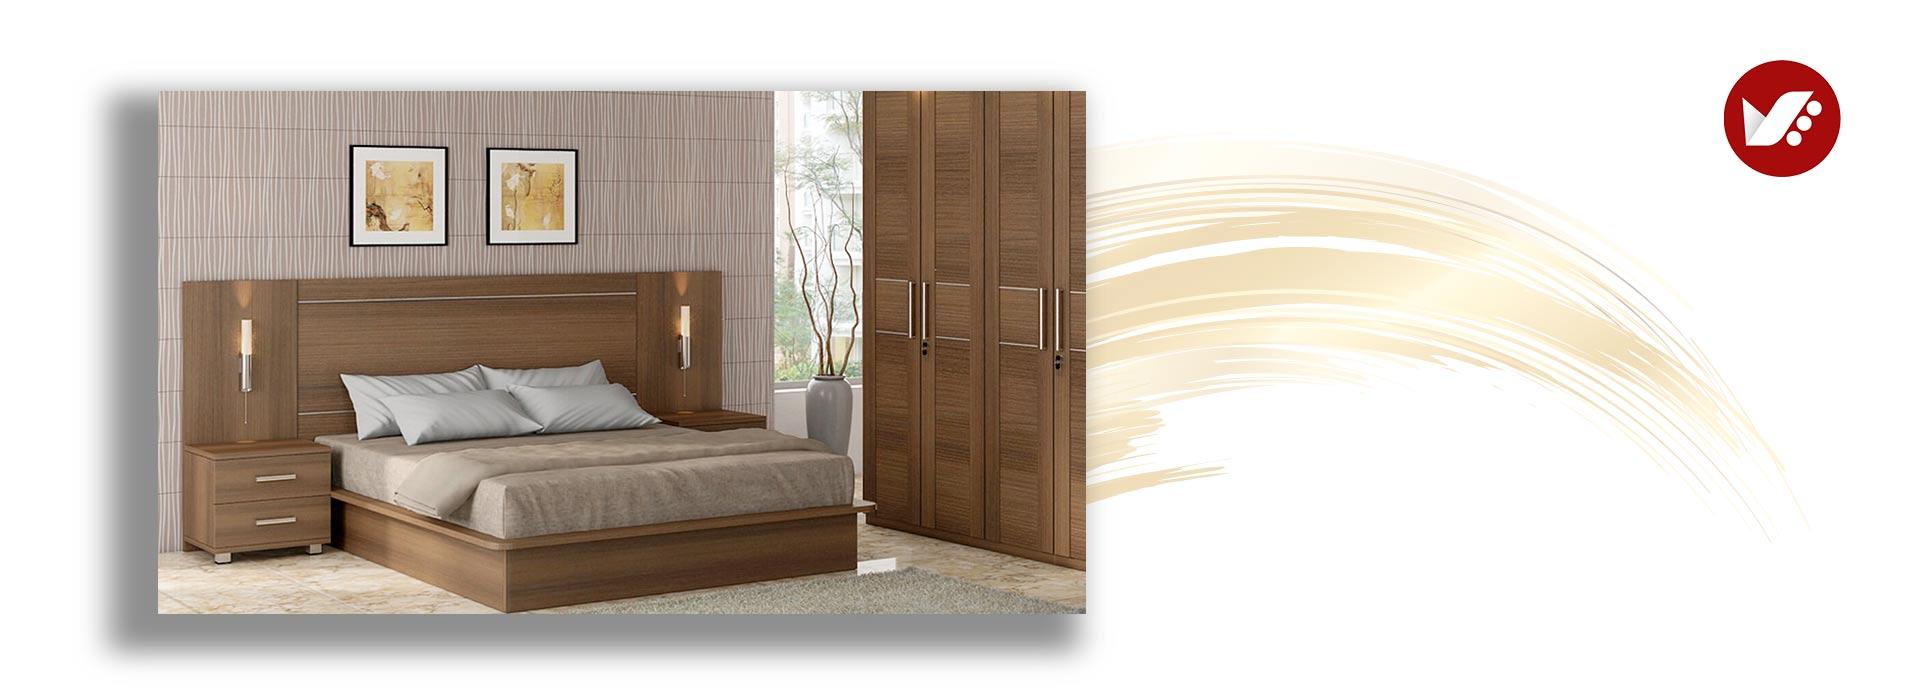 bedroom makeover wallpapers - تغییر دکوراسیون اتاق خواب